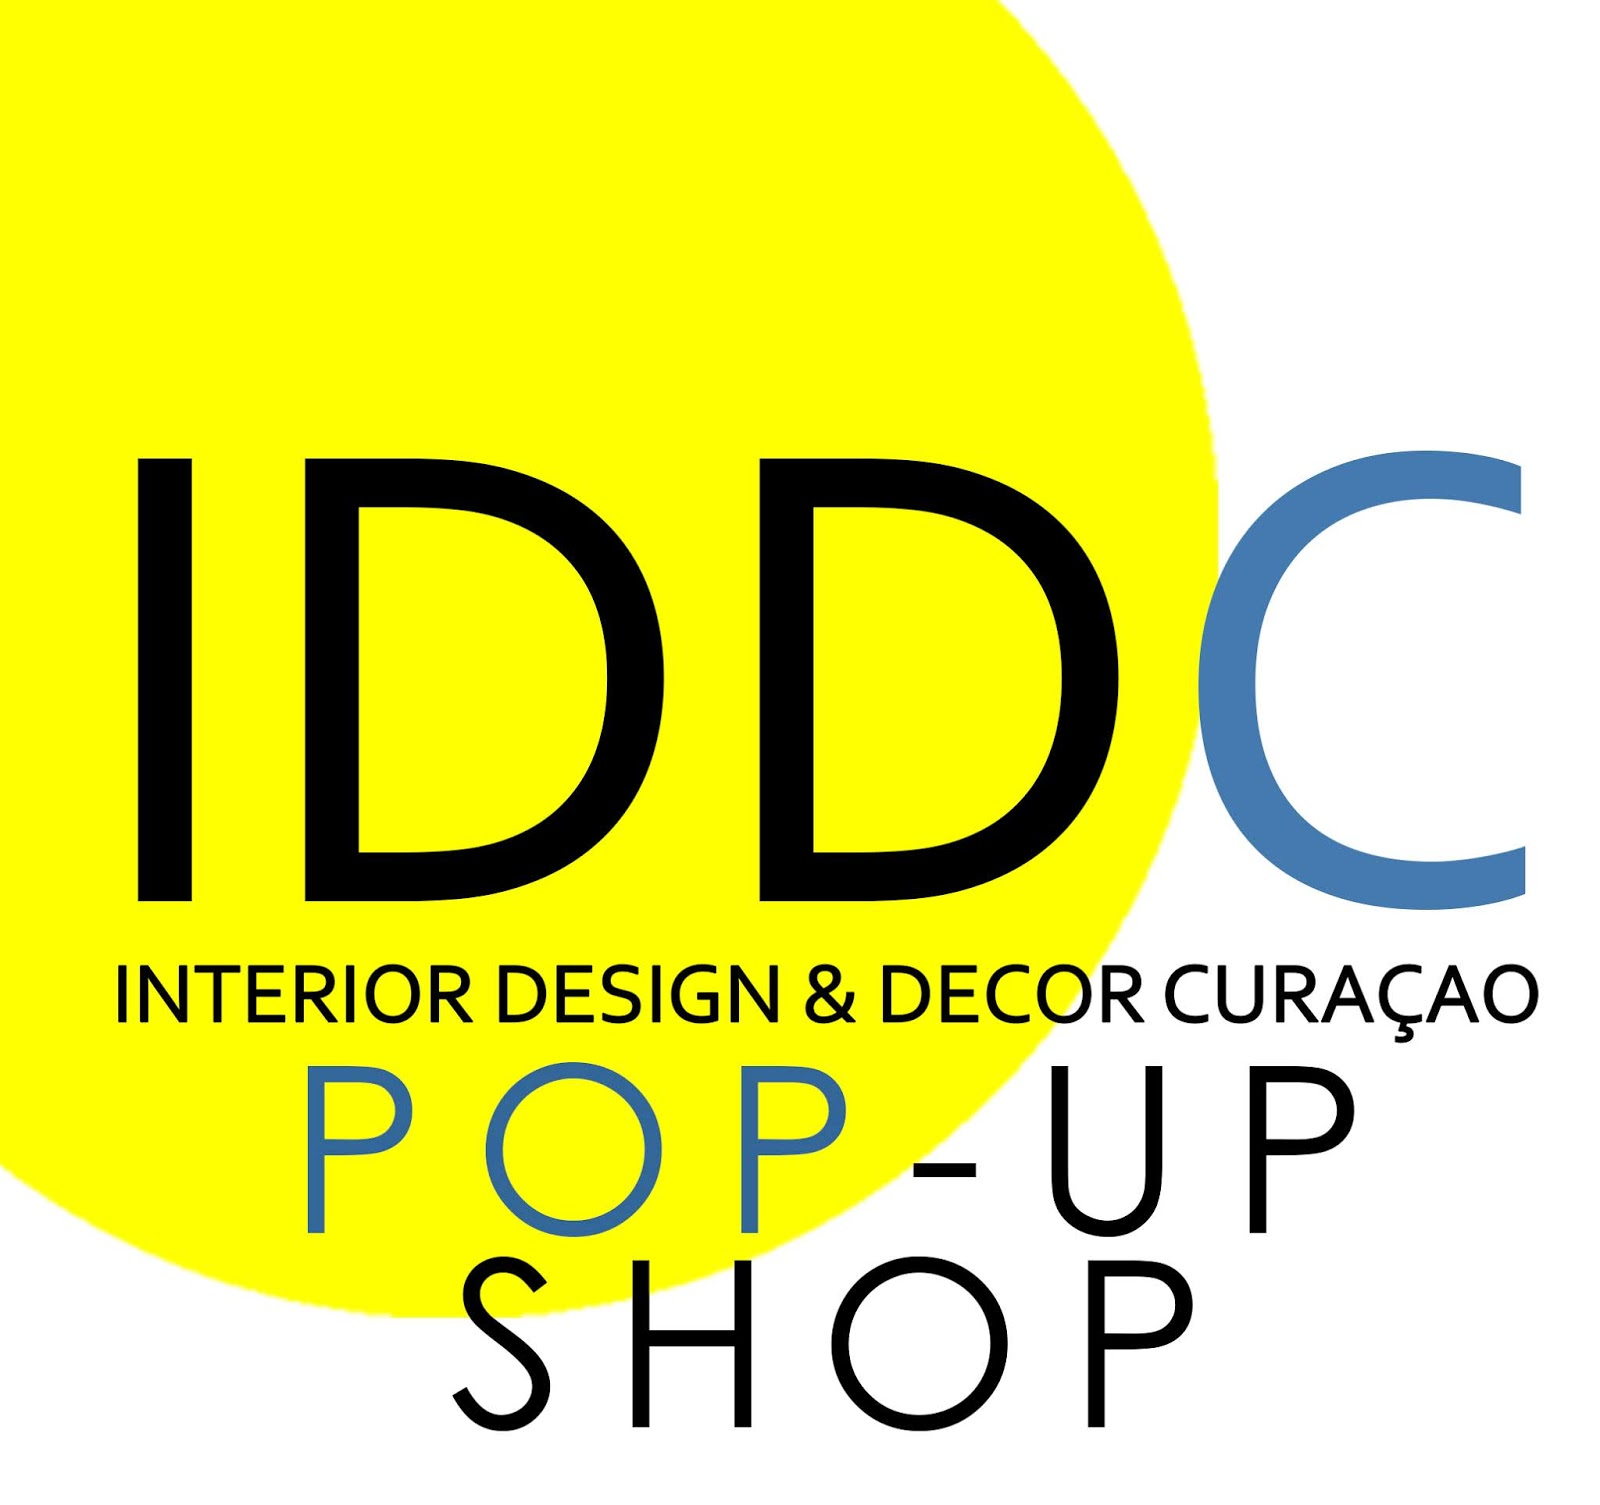 Opening Interior Design & Decor Curacao Pop-up Shop